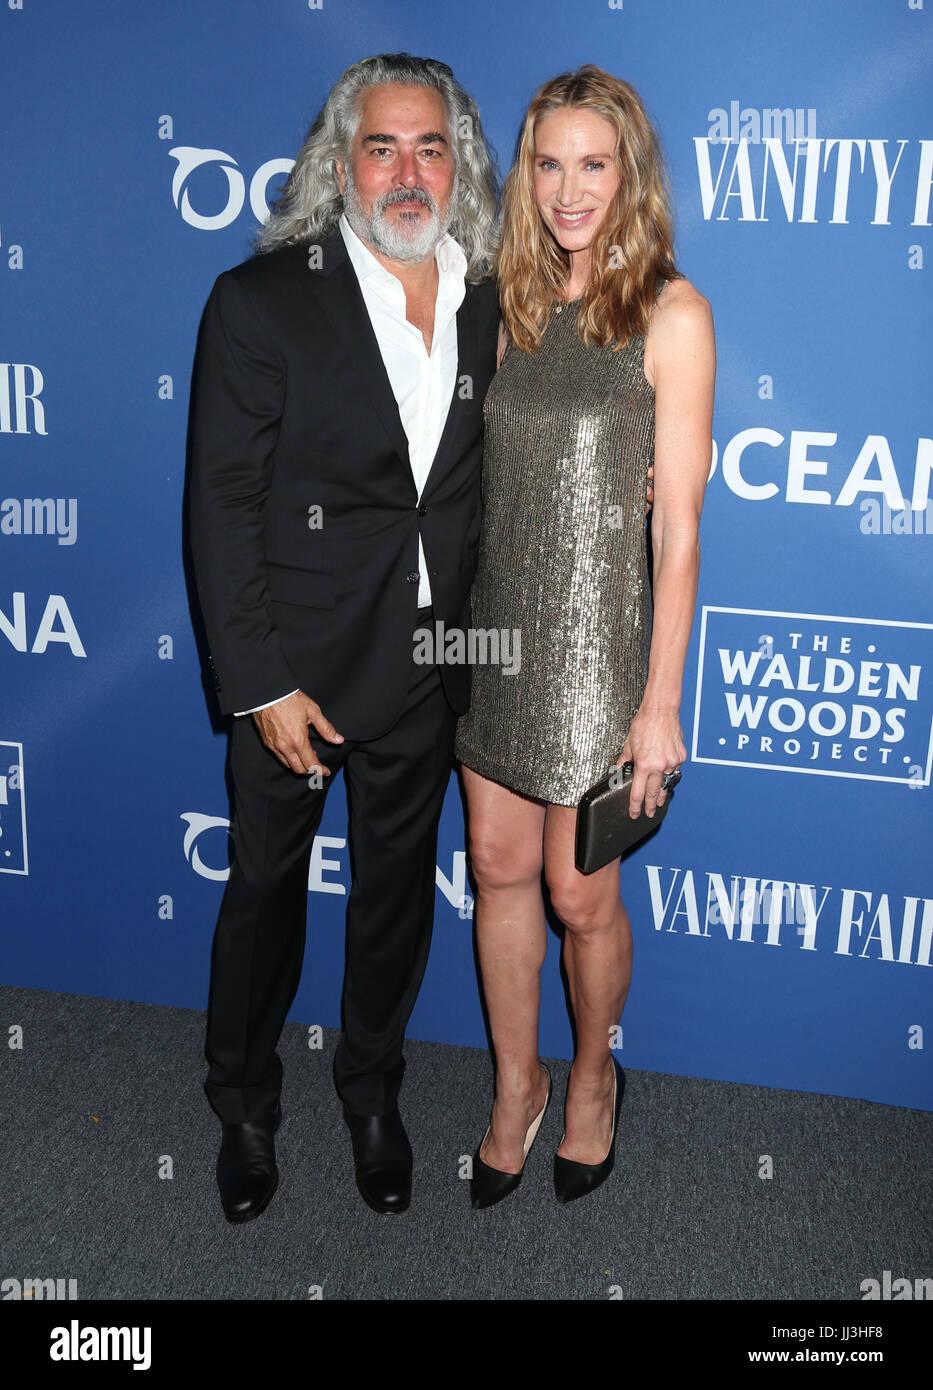 Los Angeles, USA. 17th July, 2017. Mitch Glazer and Kelly ...